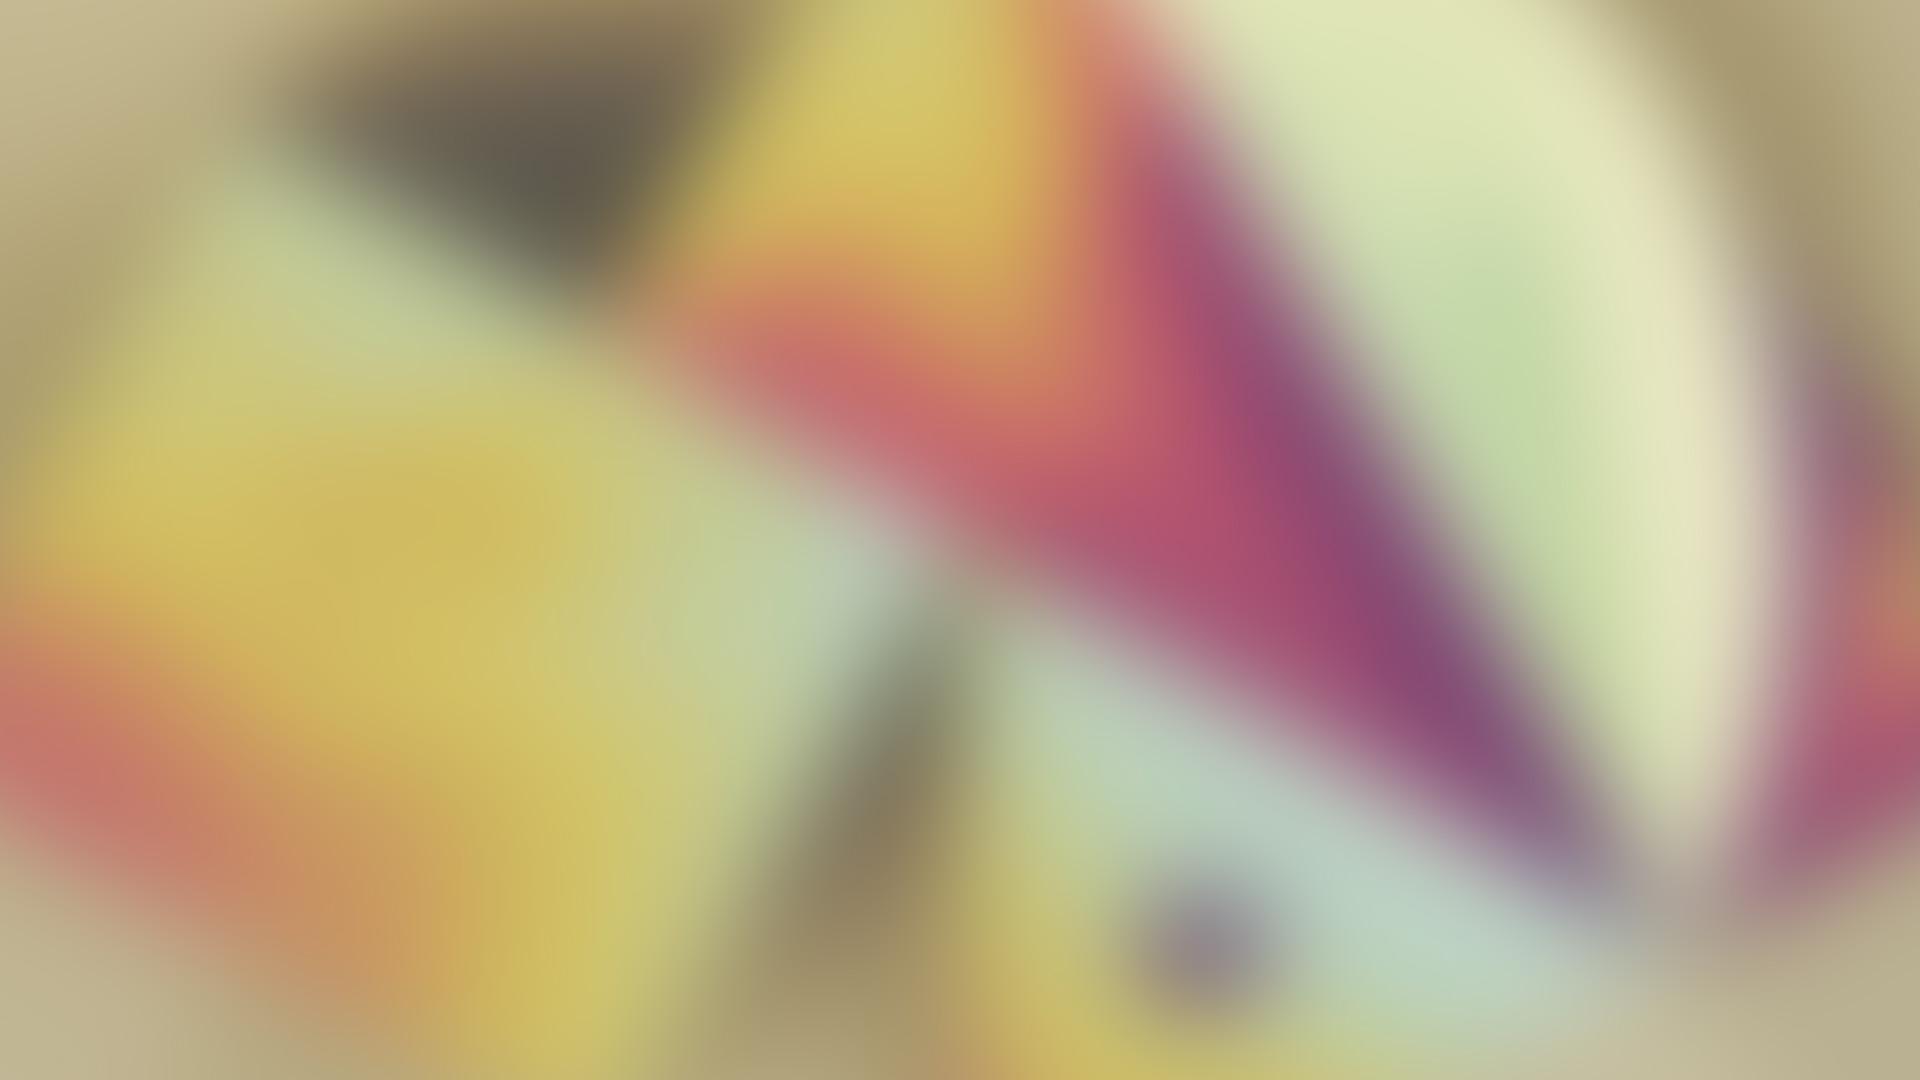 Mobilee232_JonasRathsman_NoSurprise_bg-blur